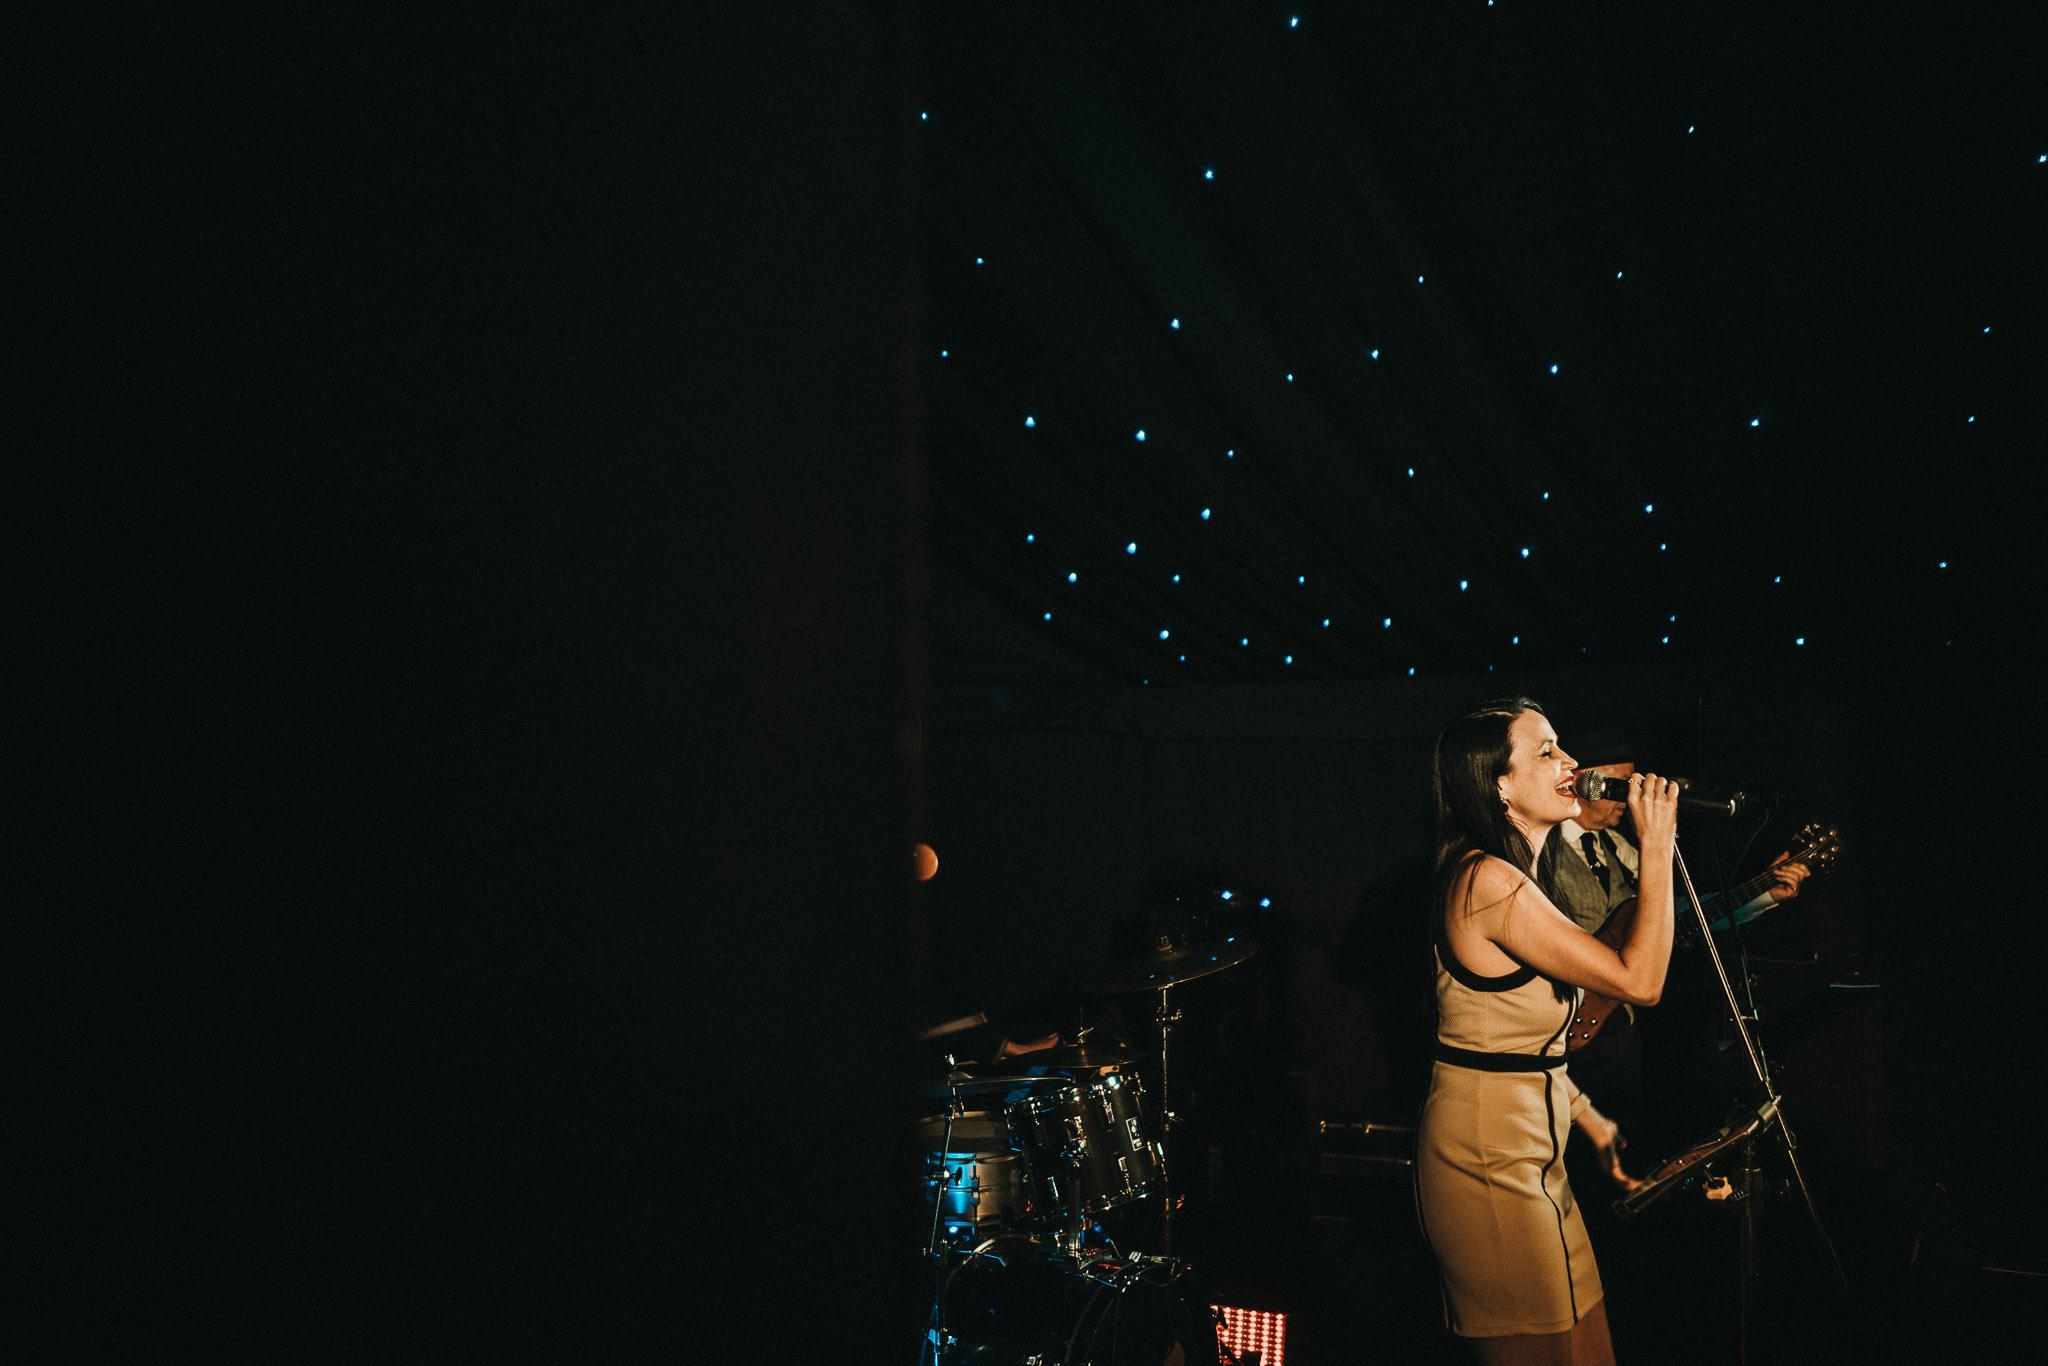 wedding-singer